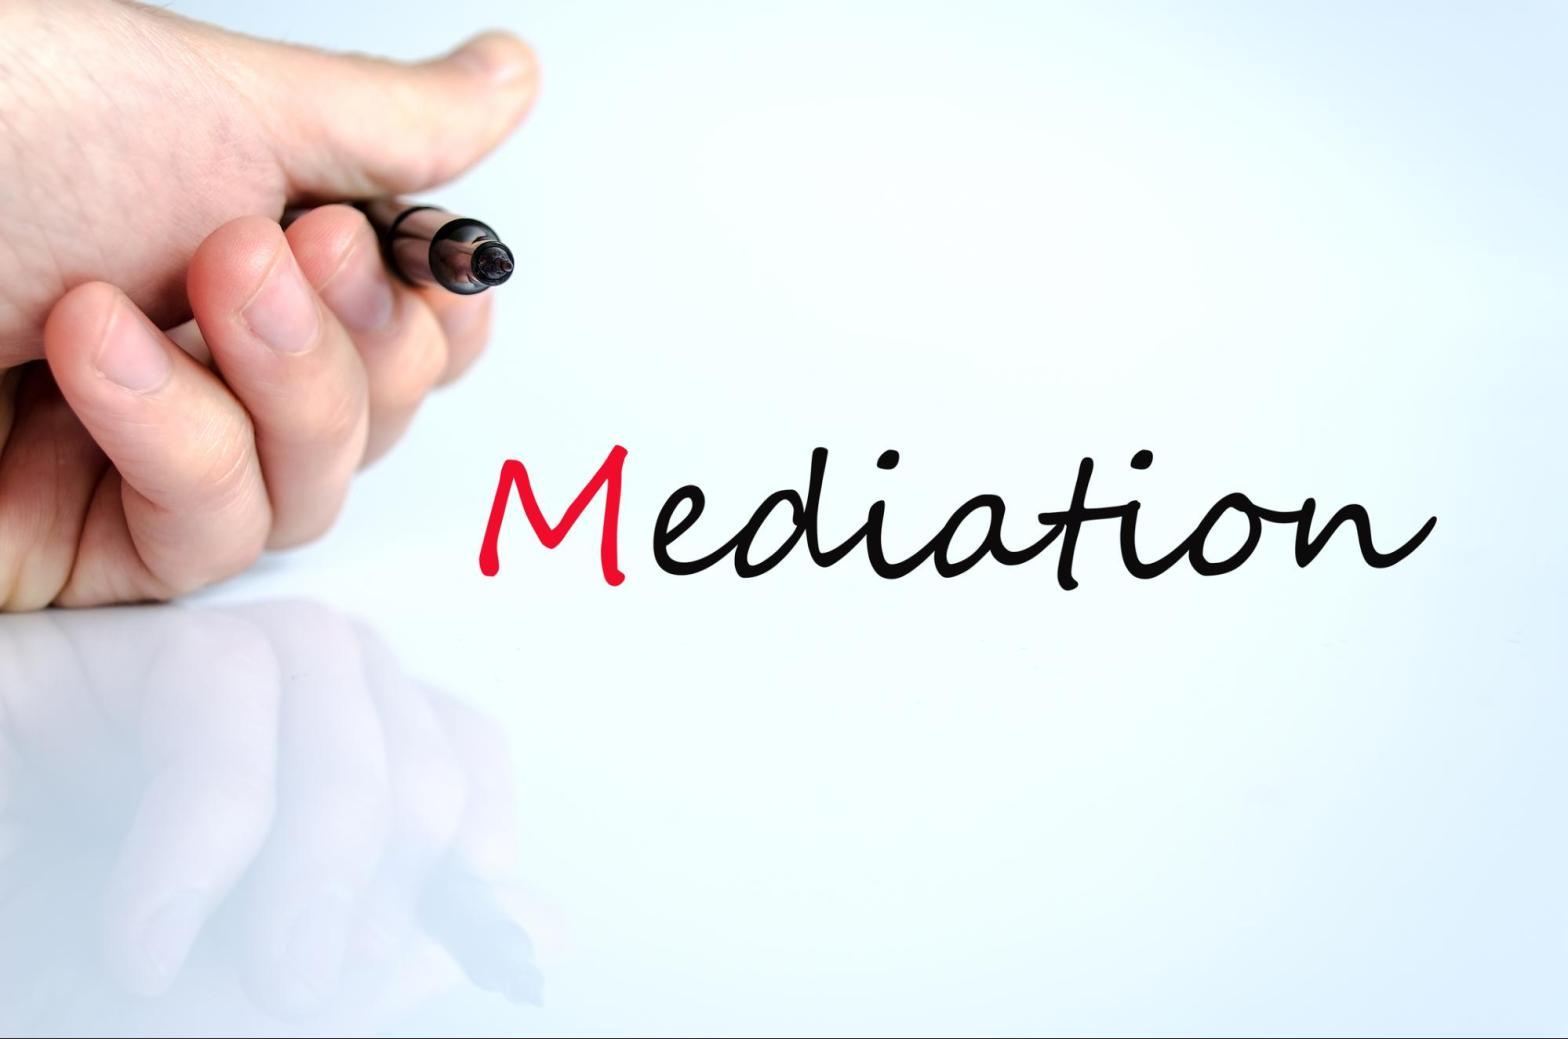 Mediation is Teamwork